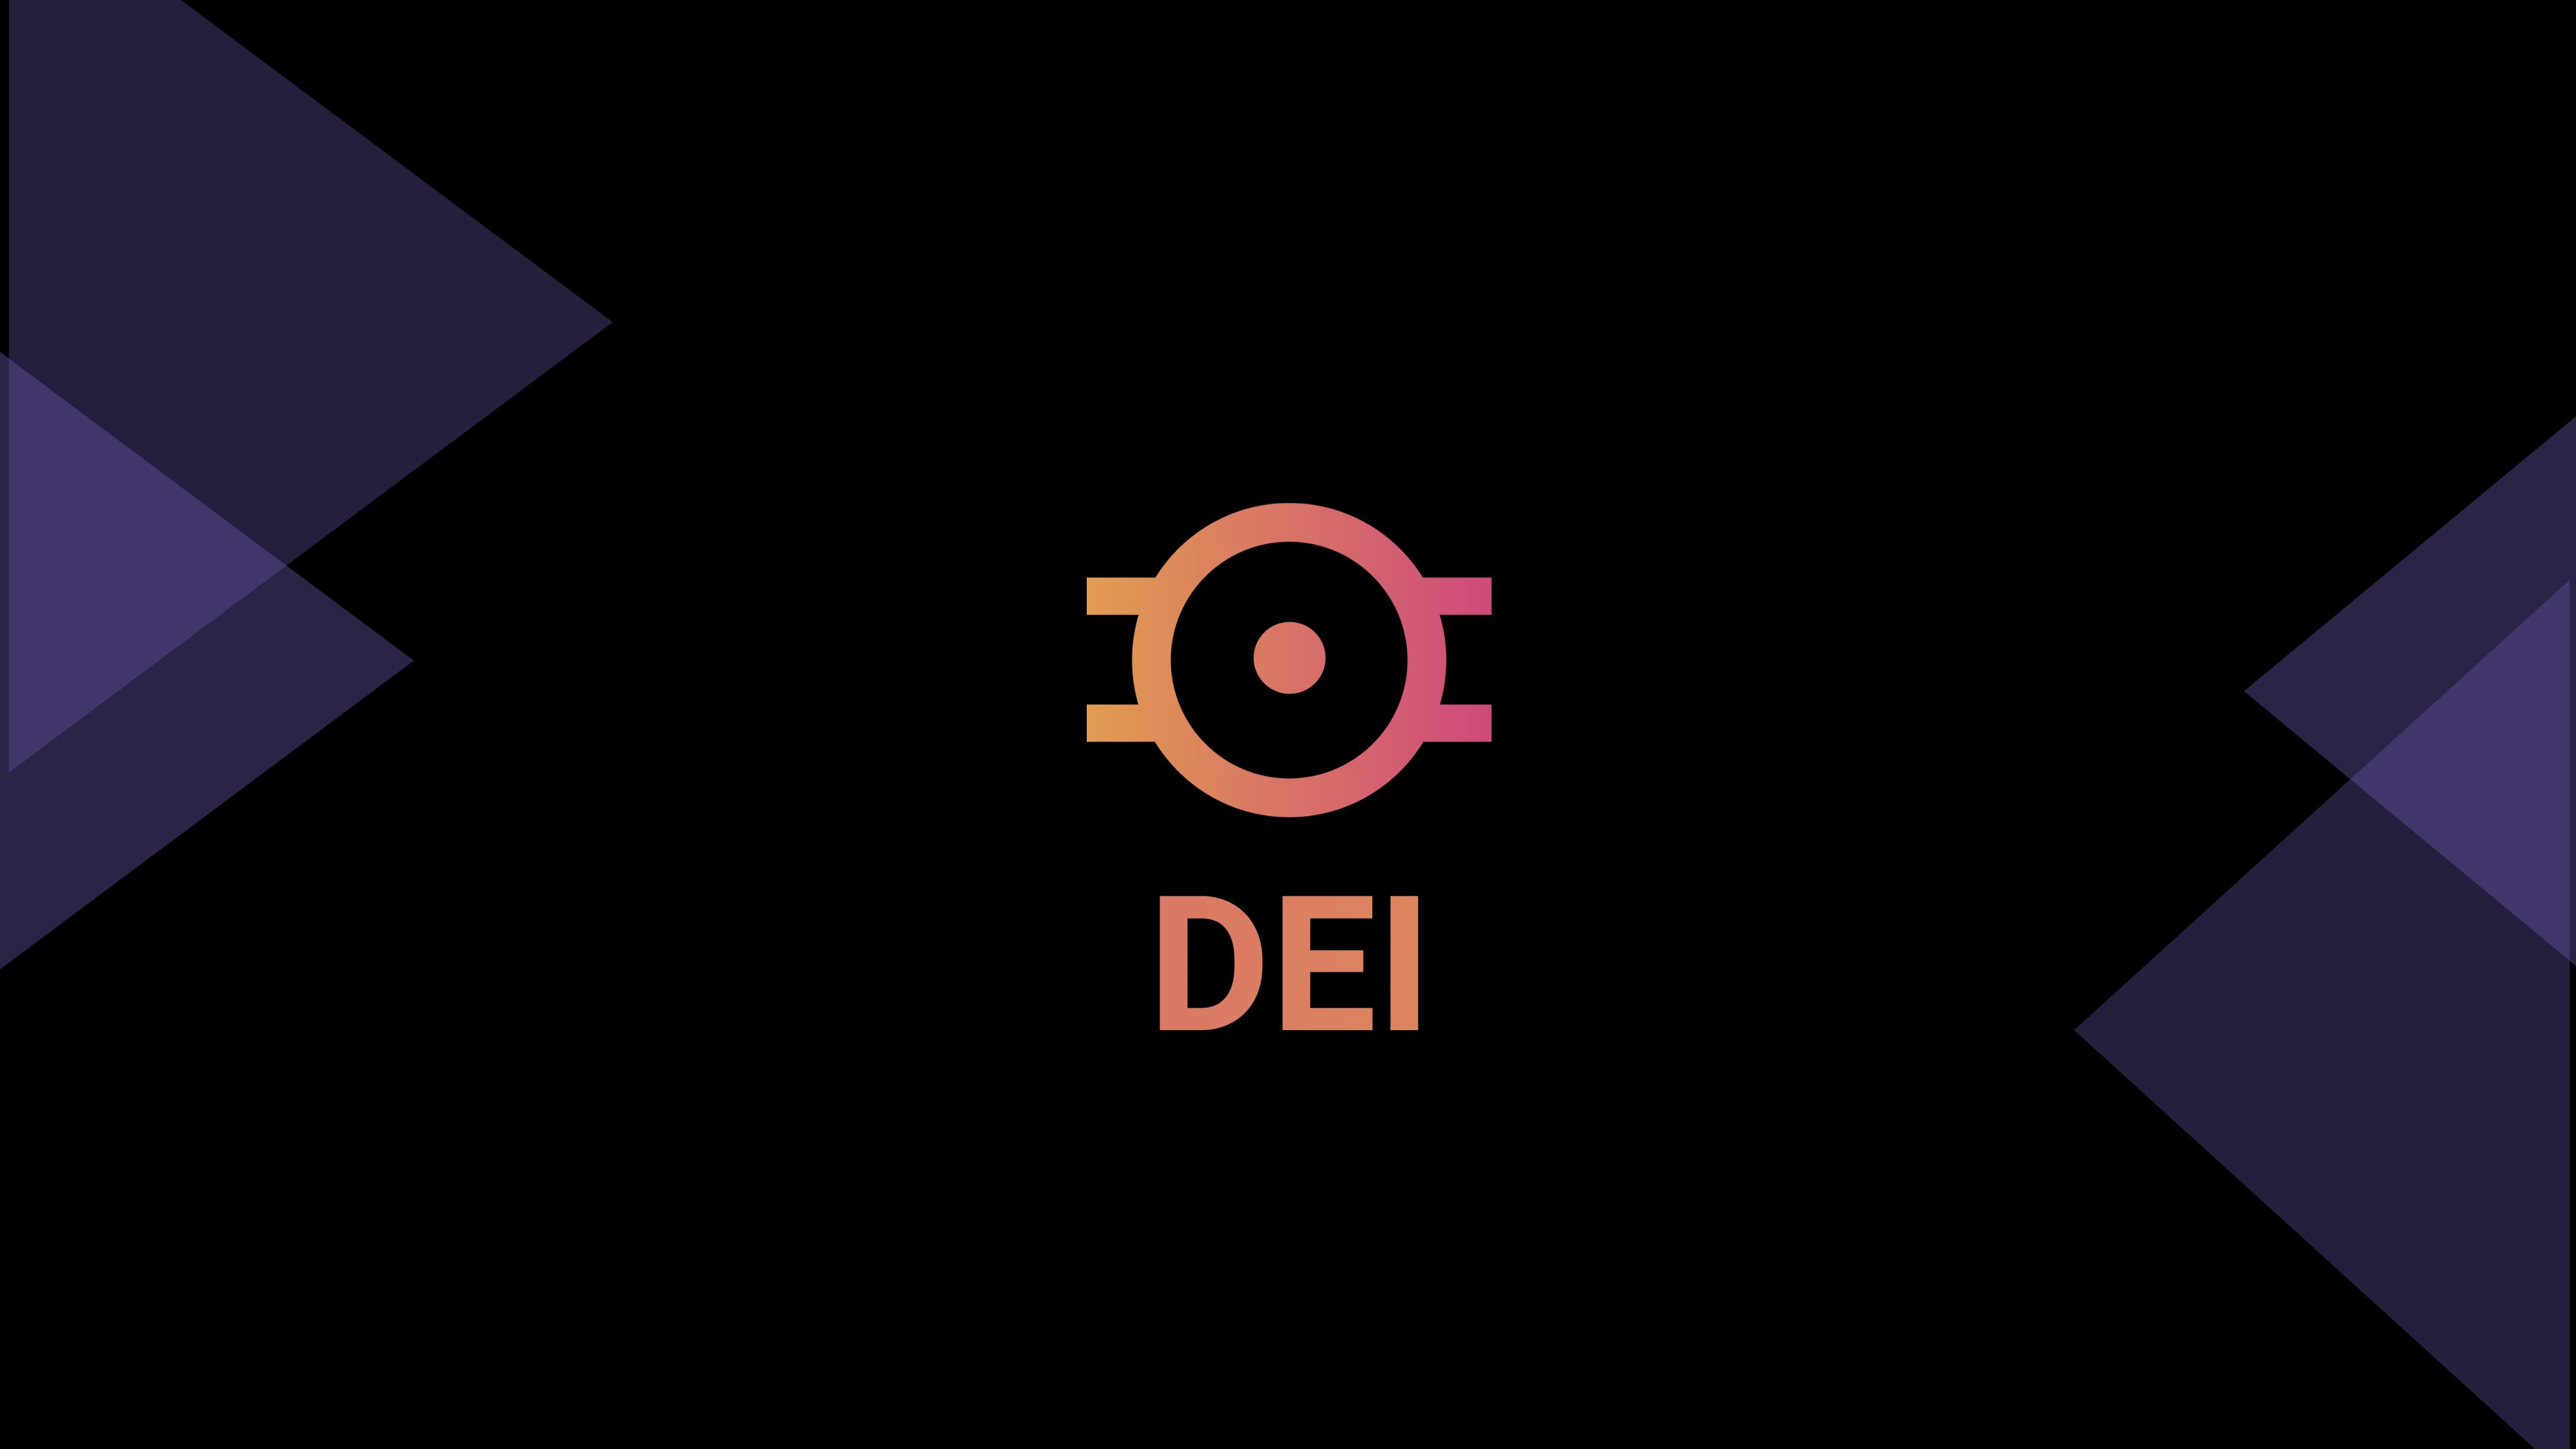 Muon Powering DEI stablecoin